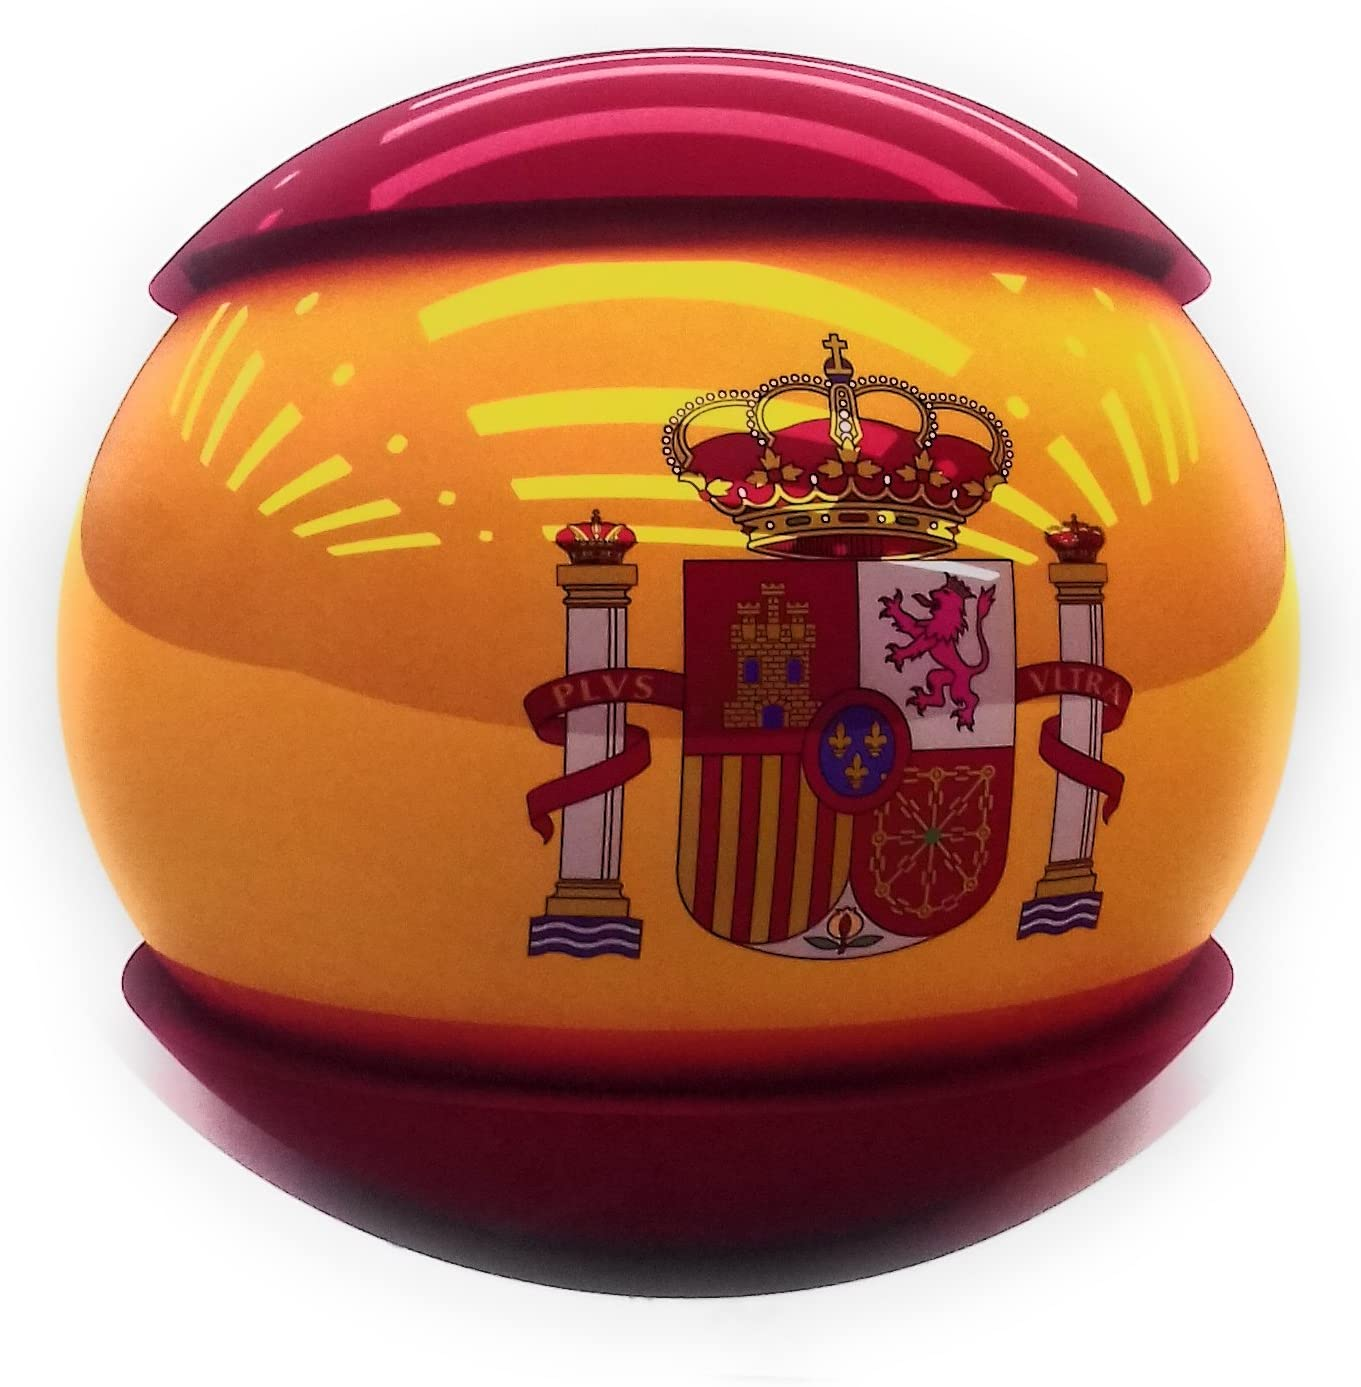 Pegatina Bandera de España con Escudo de España, Adhesiva Redonda Diámetro 13 cm: Amazon.es: Coche y moto